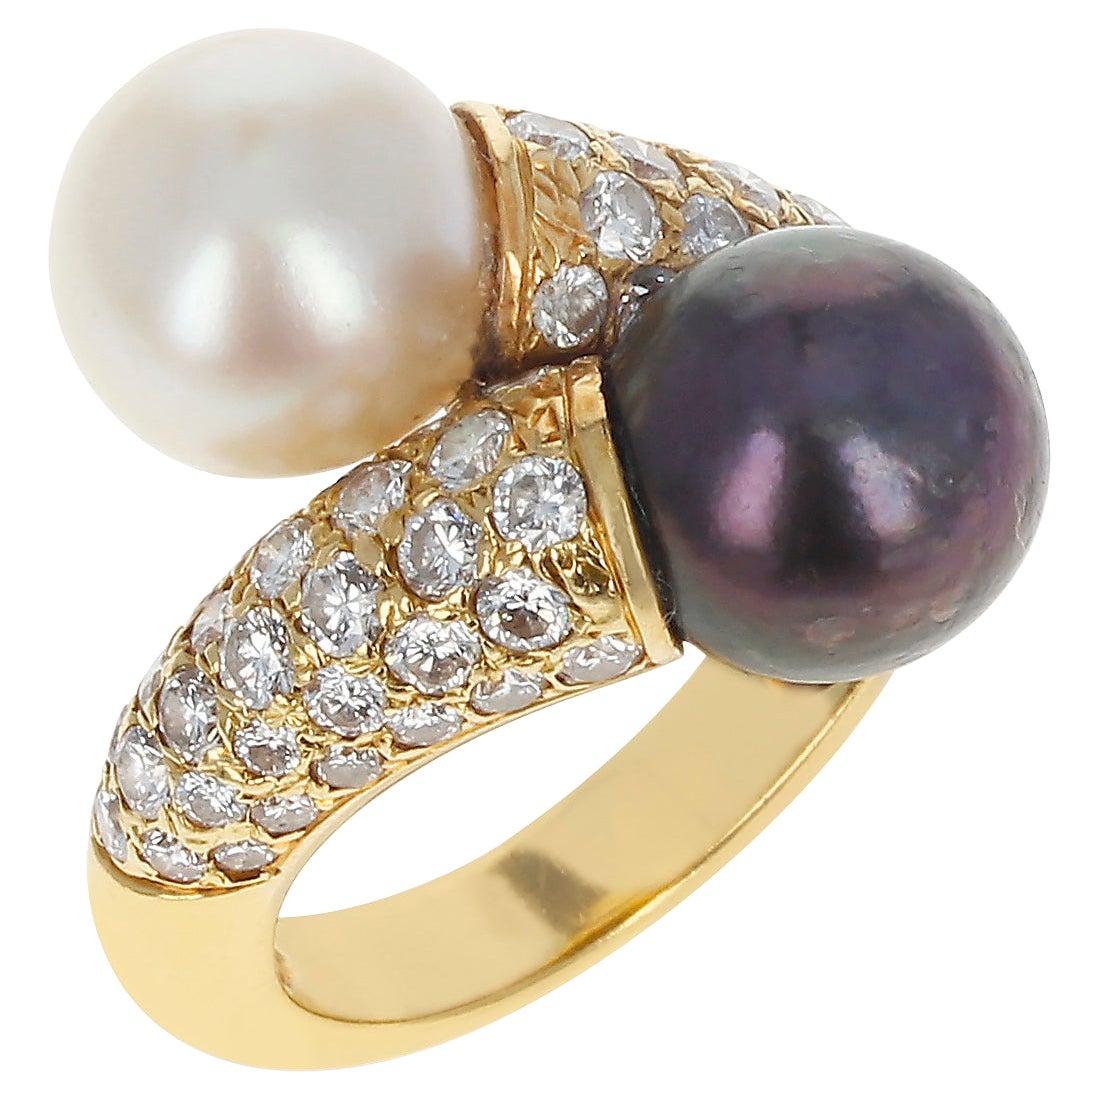 Van Cleef & Arpels Toi Et Moi Pearl and Diamond Ring, 18 Karat Yellow Gold